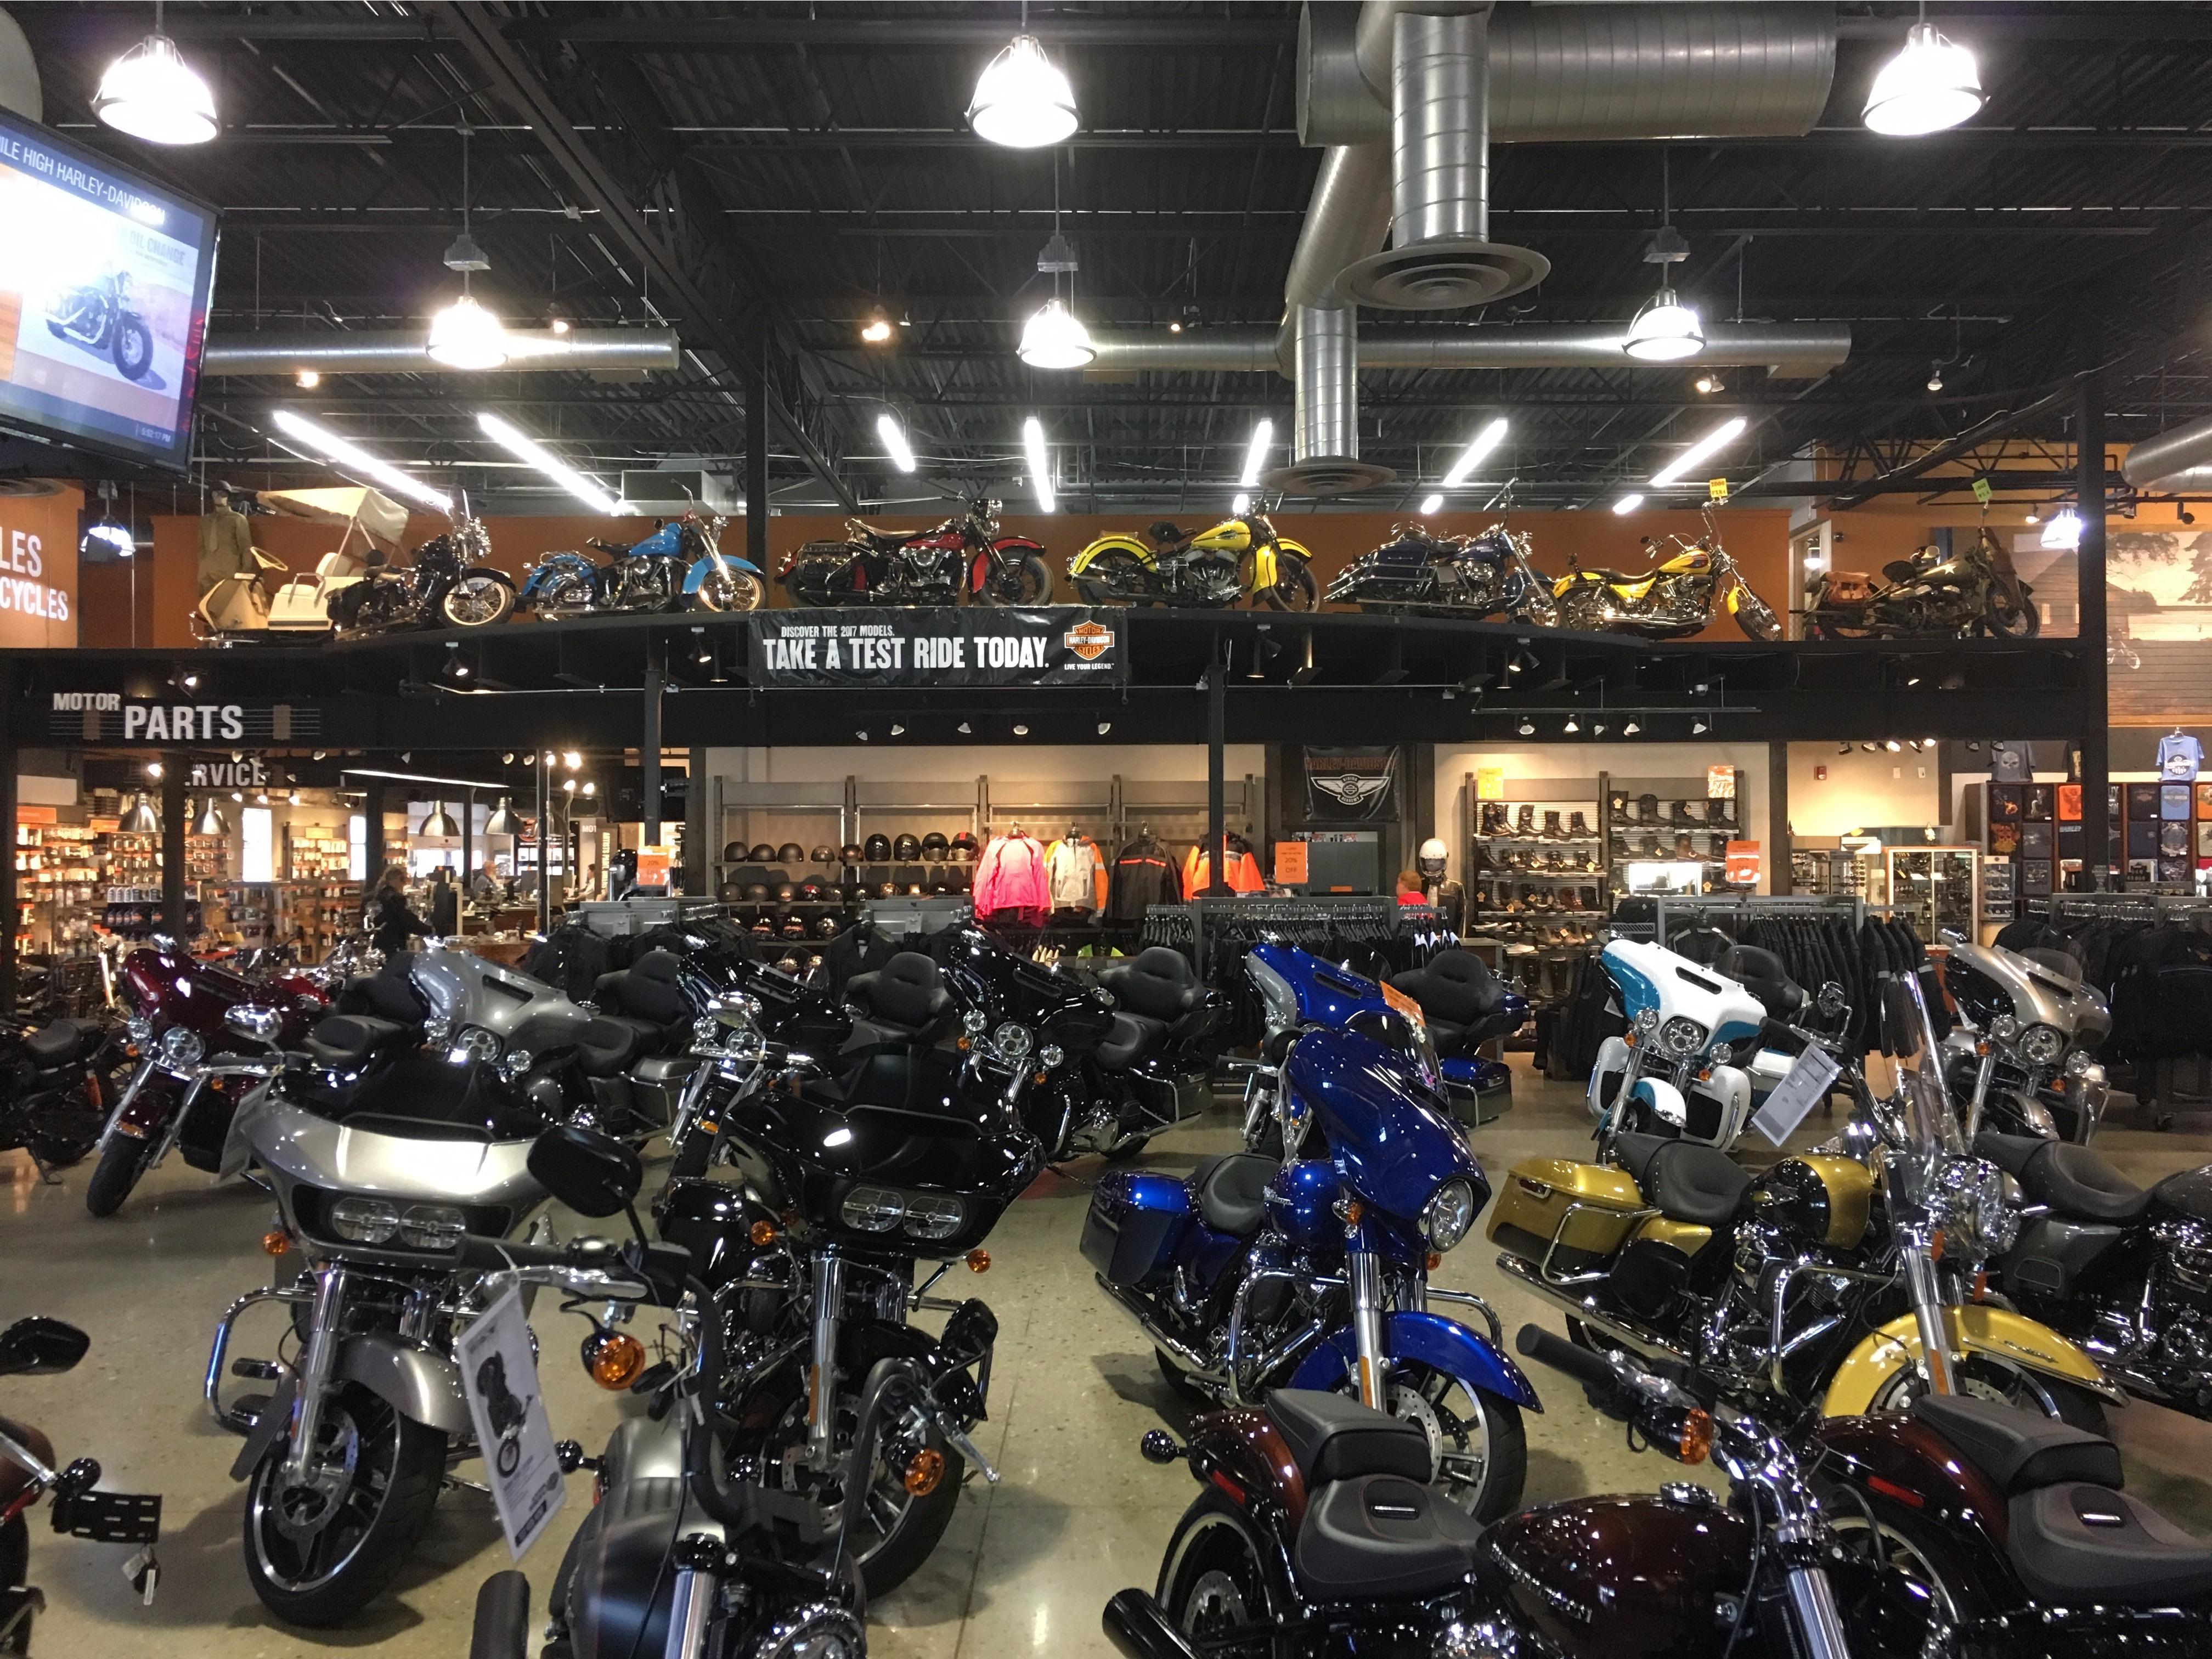 Mile High Harley-Davidson